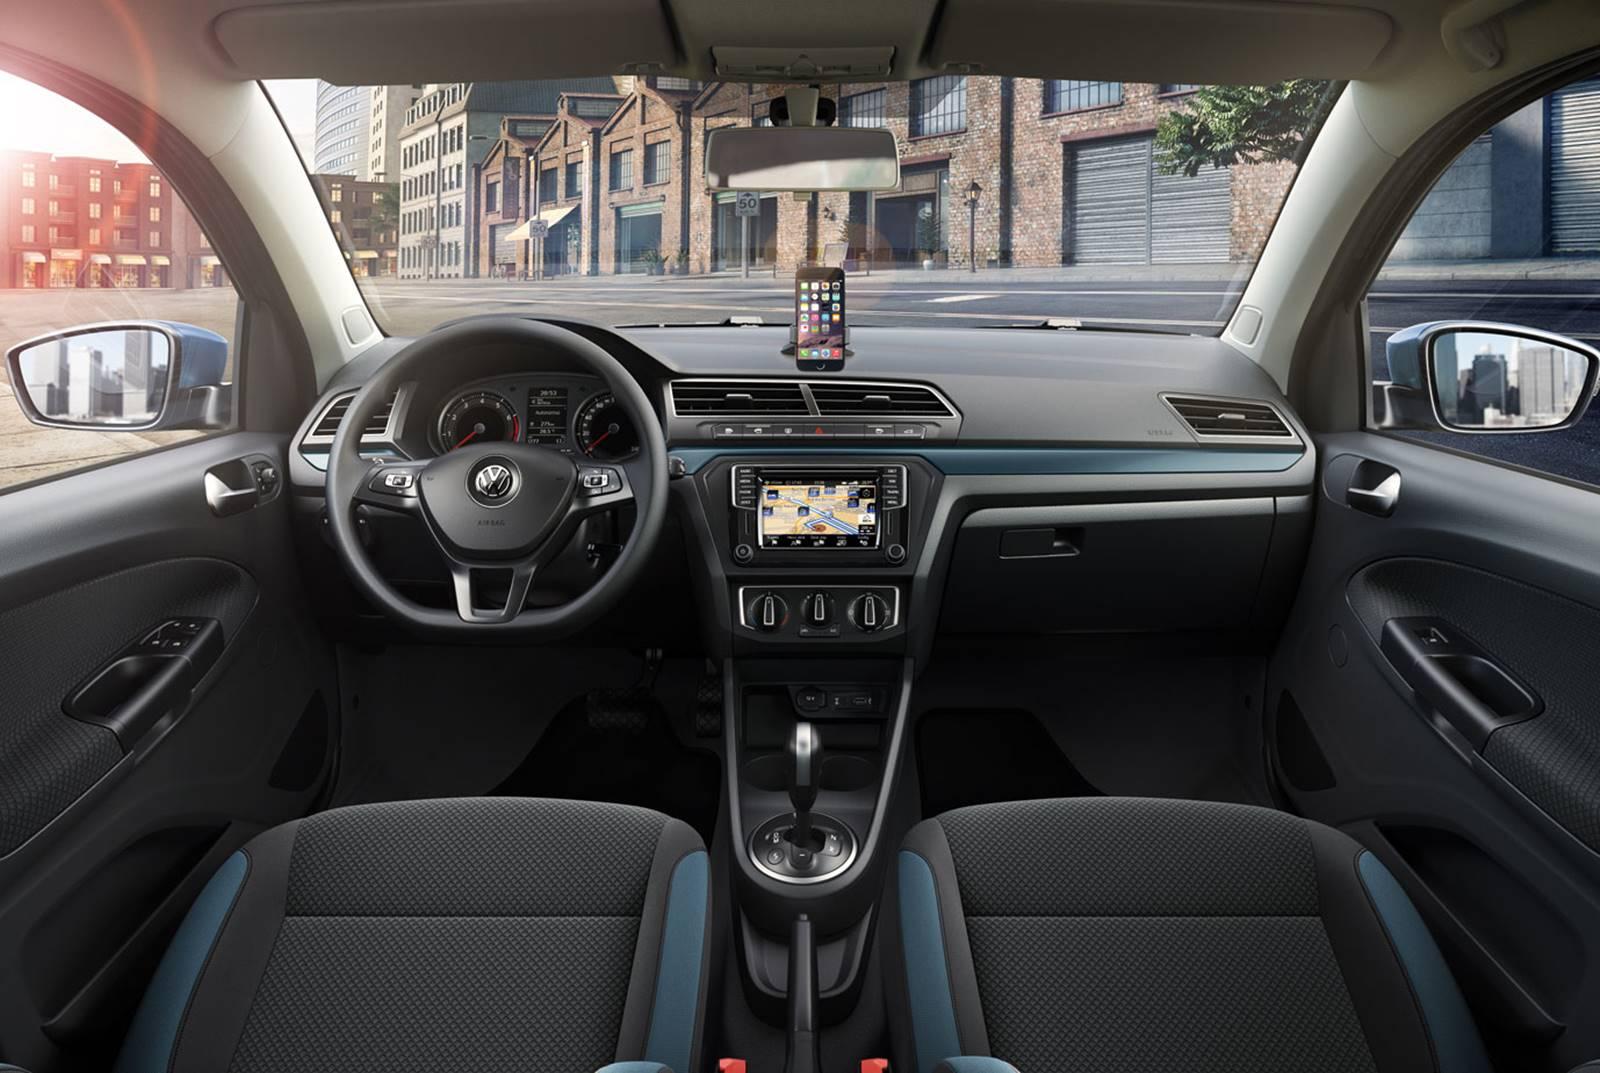 Sobre Volkswagen Gol Novo-Gol-2017-highline%2B%25282%2529